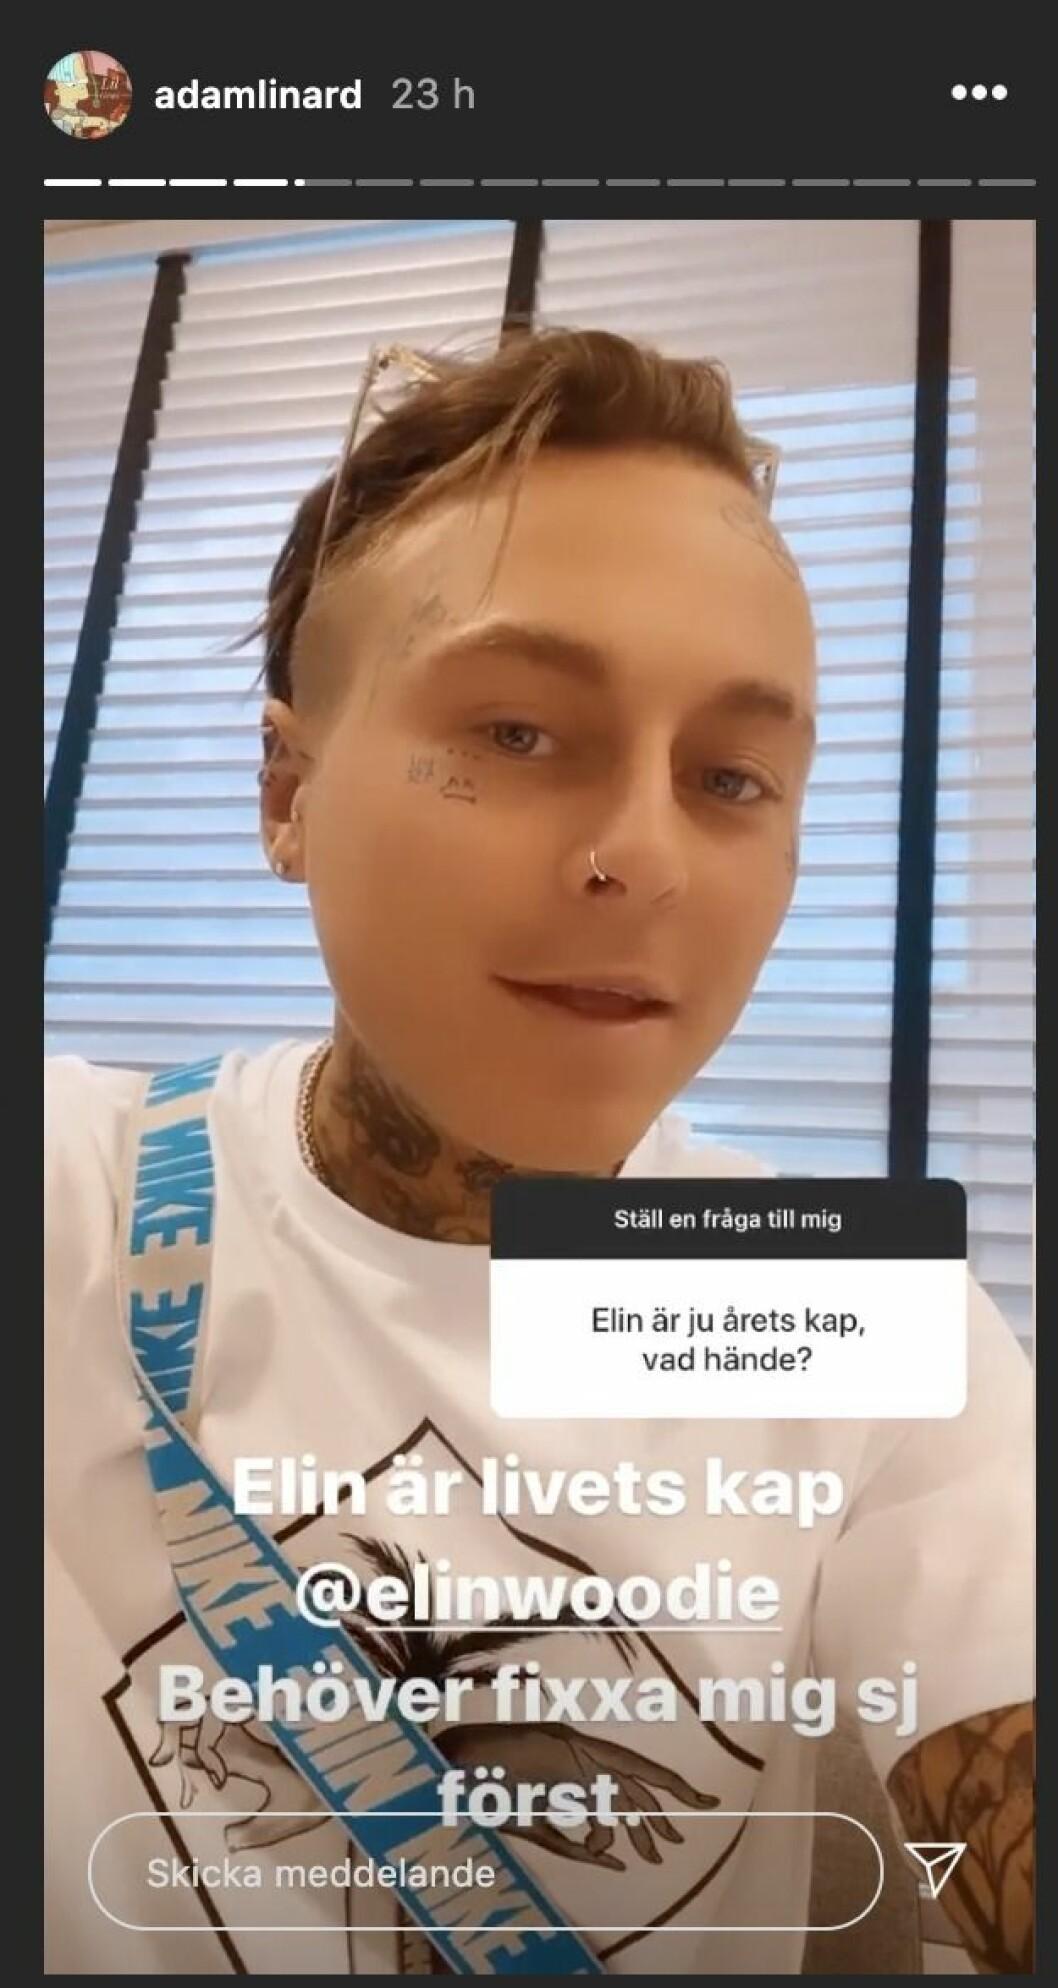 Adam Linards Instagram story